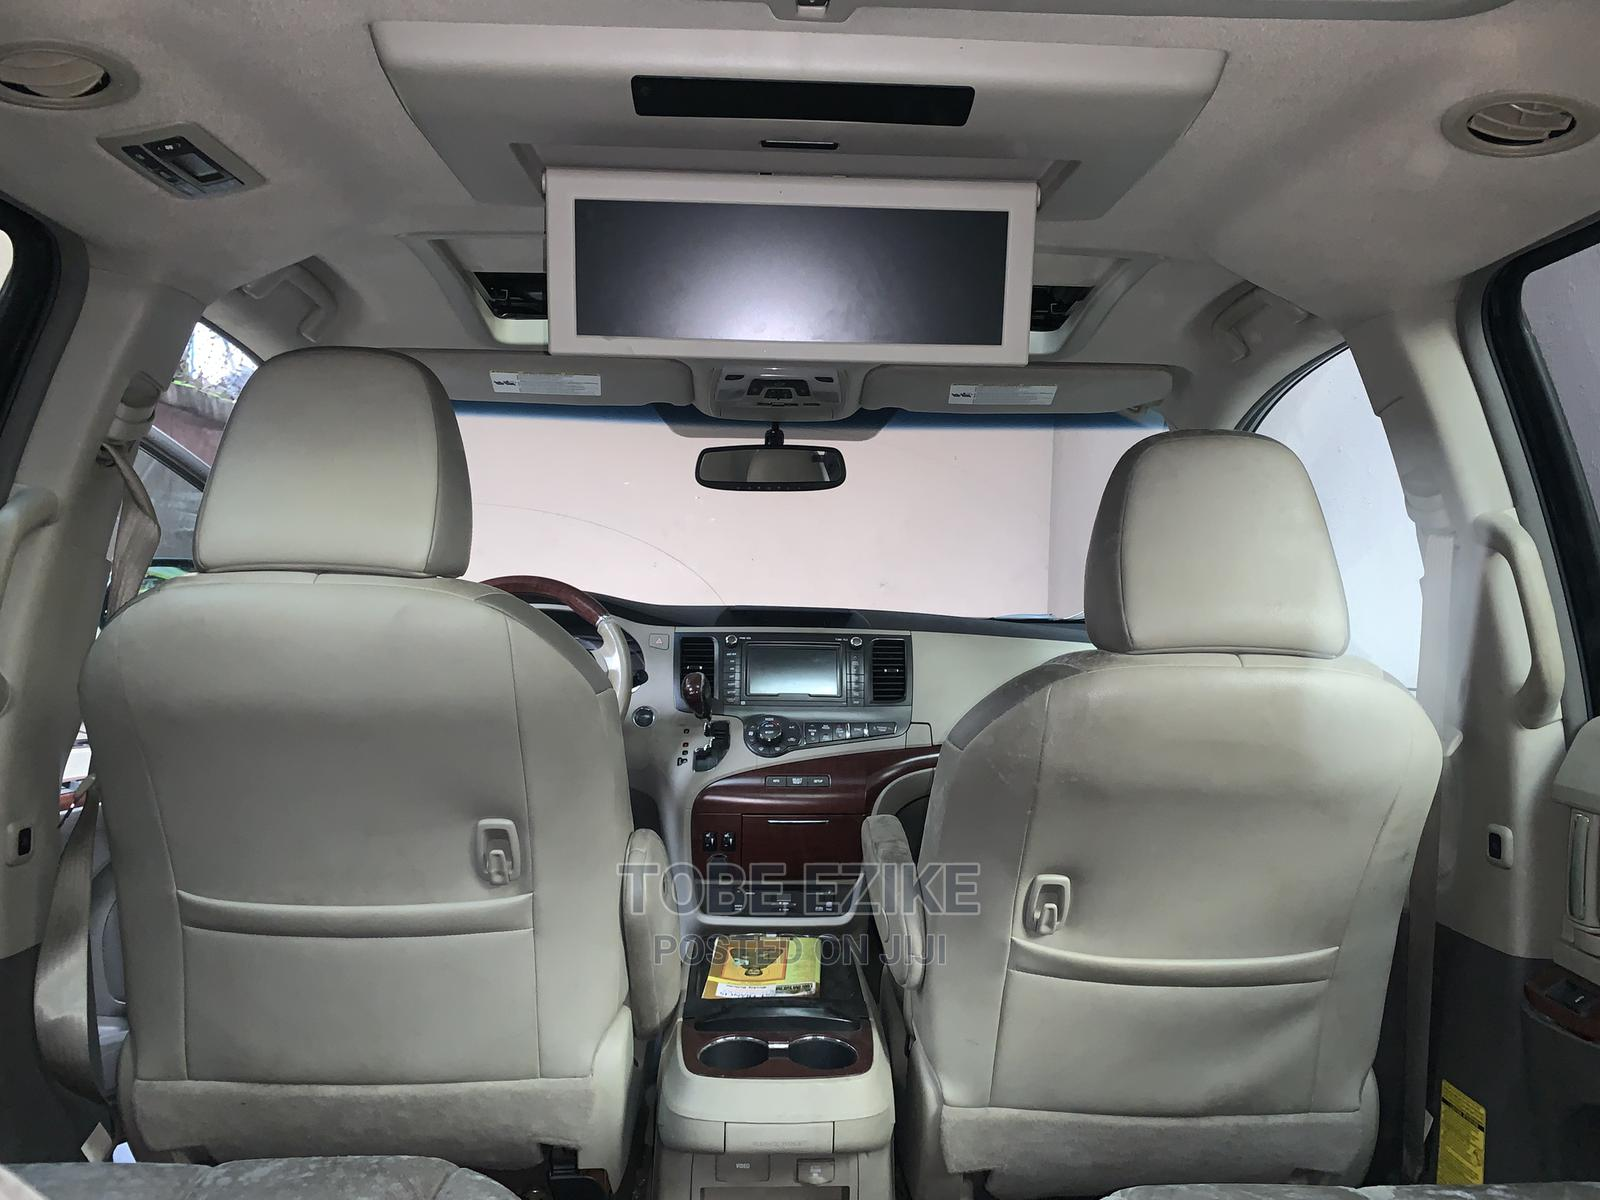 Archive: Toyota Sienna 2012 XLE 7 Passenger Black